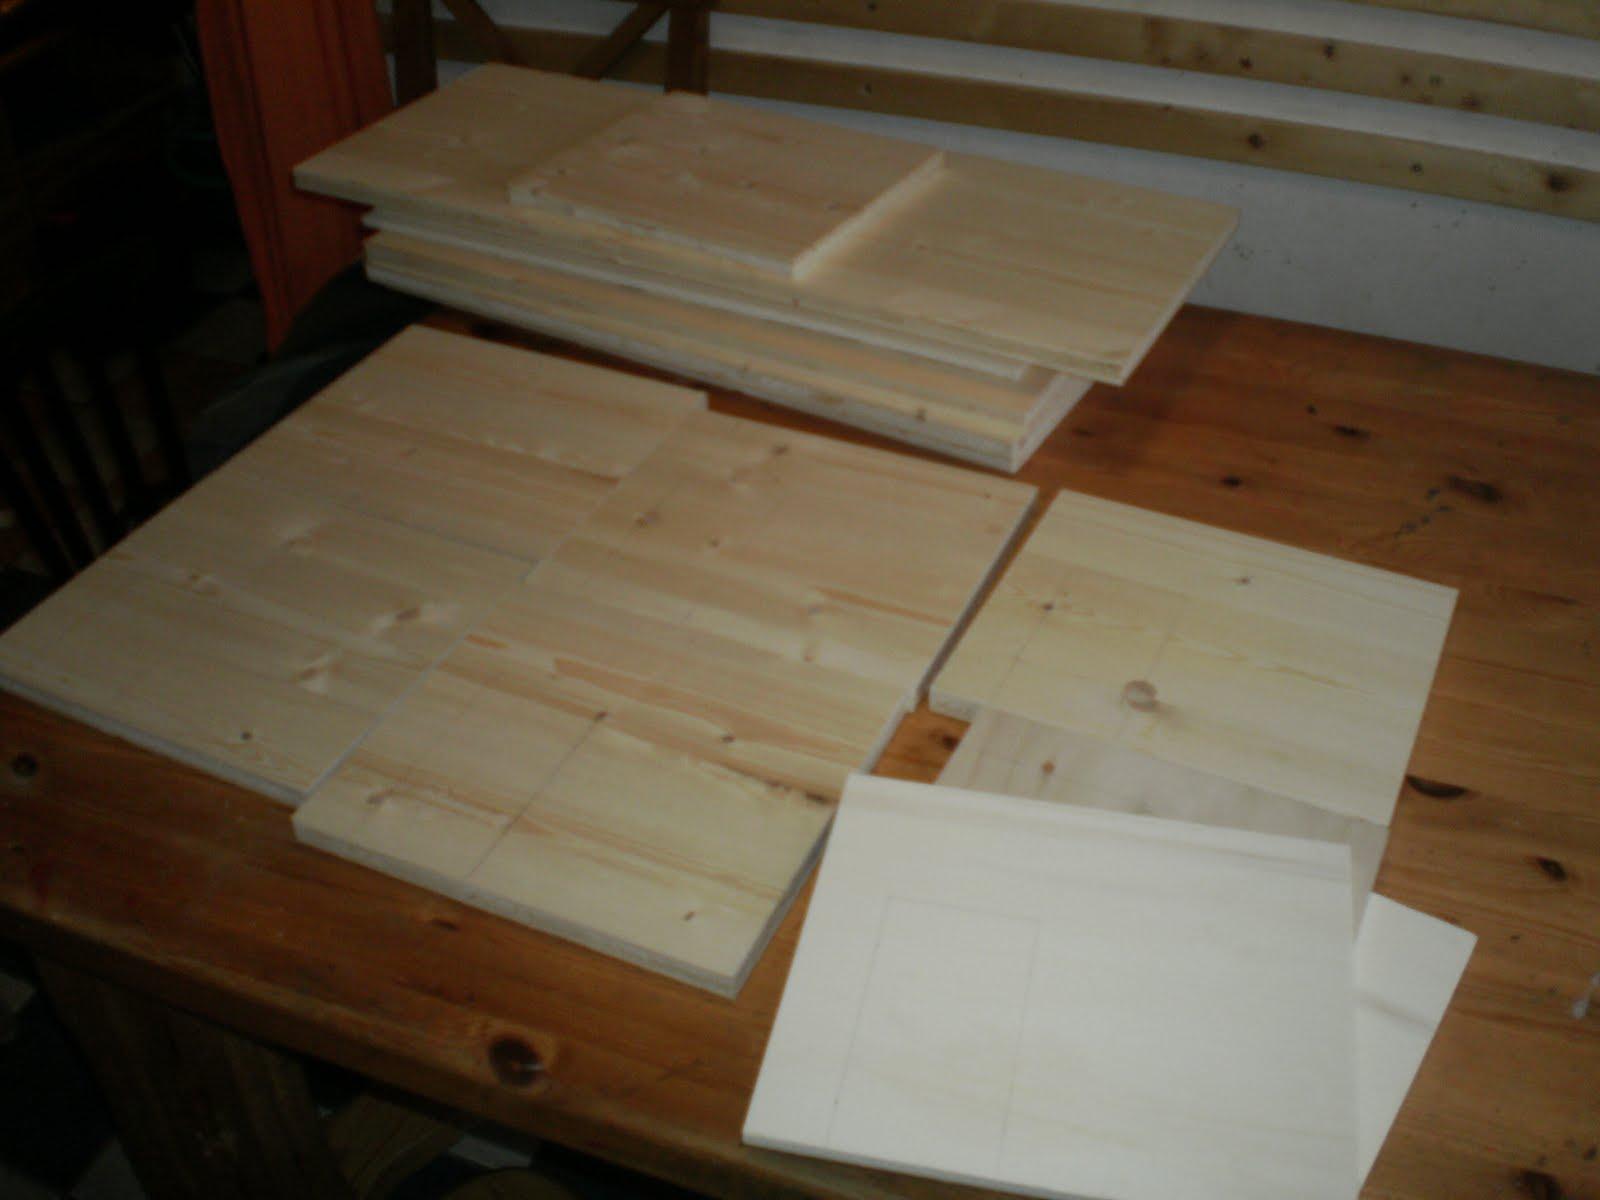 gyerekes r sok kindereien babah z p t s puppenhaus selber bauen. Black Bedroom Furniture Sets. Home Design Ideas